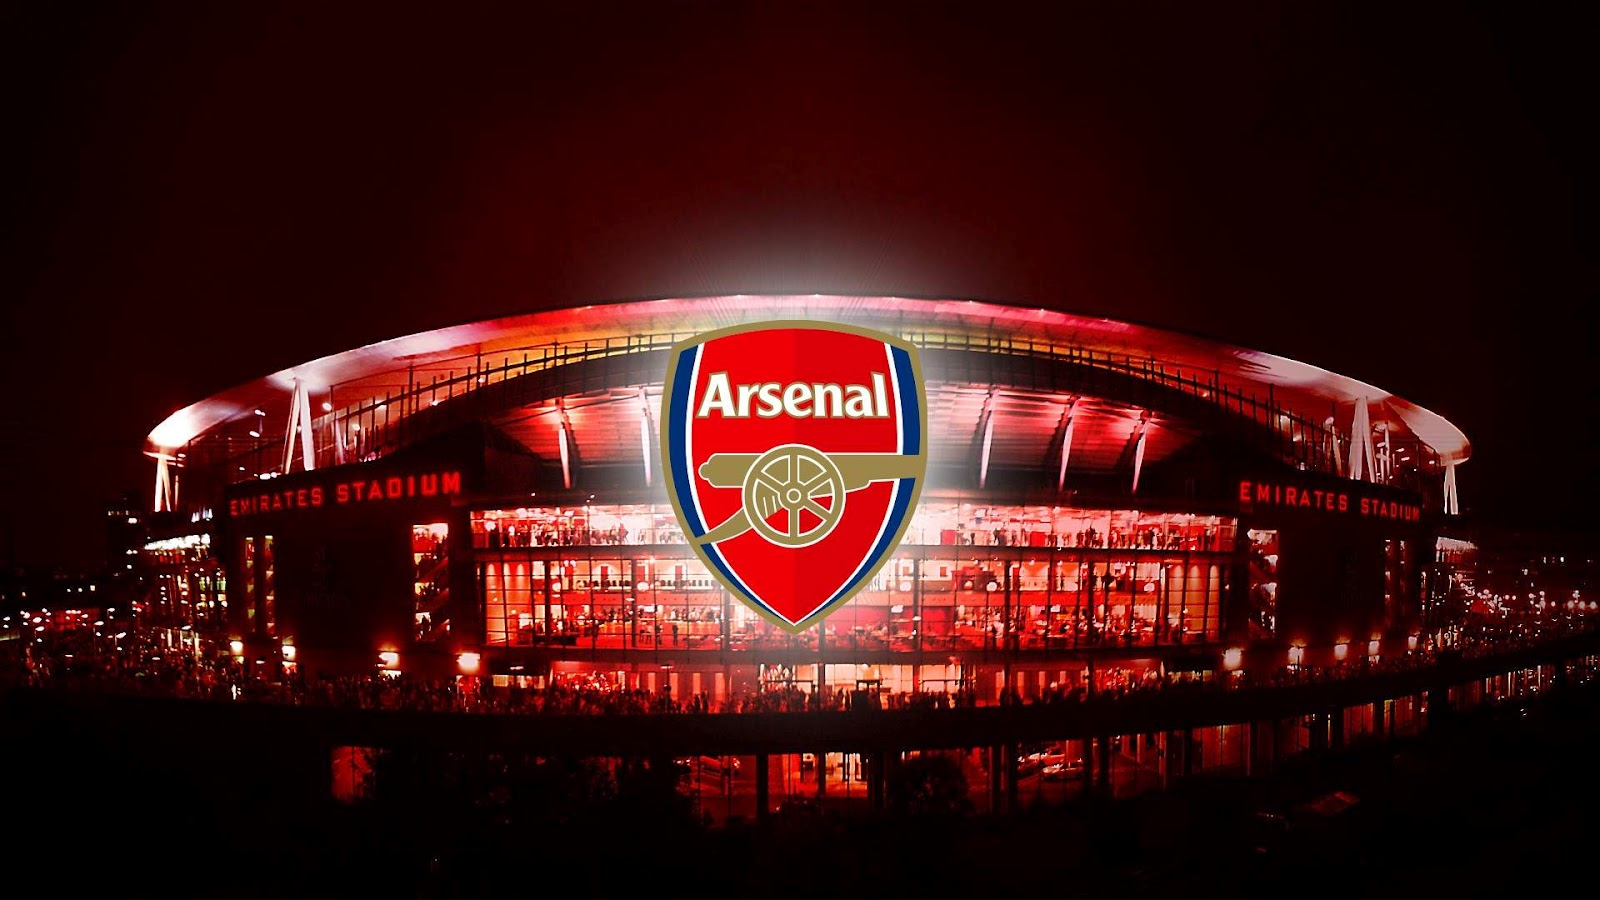 Emirates Stadium Arsenal HD Wallpaper 1062 1600x900